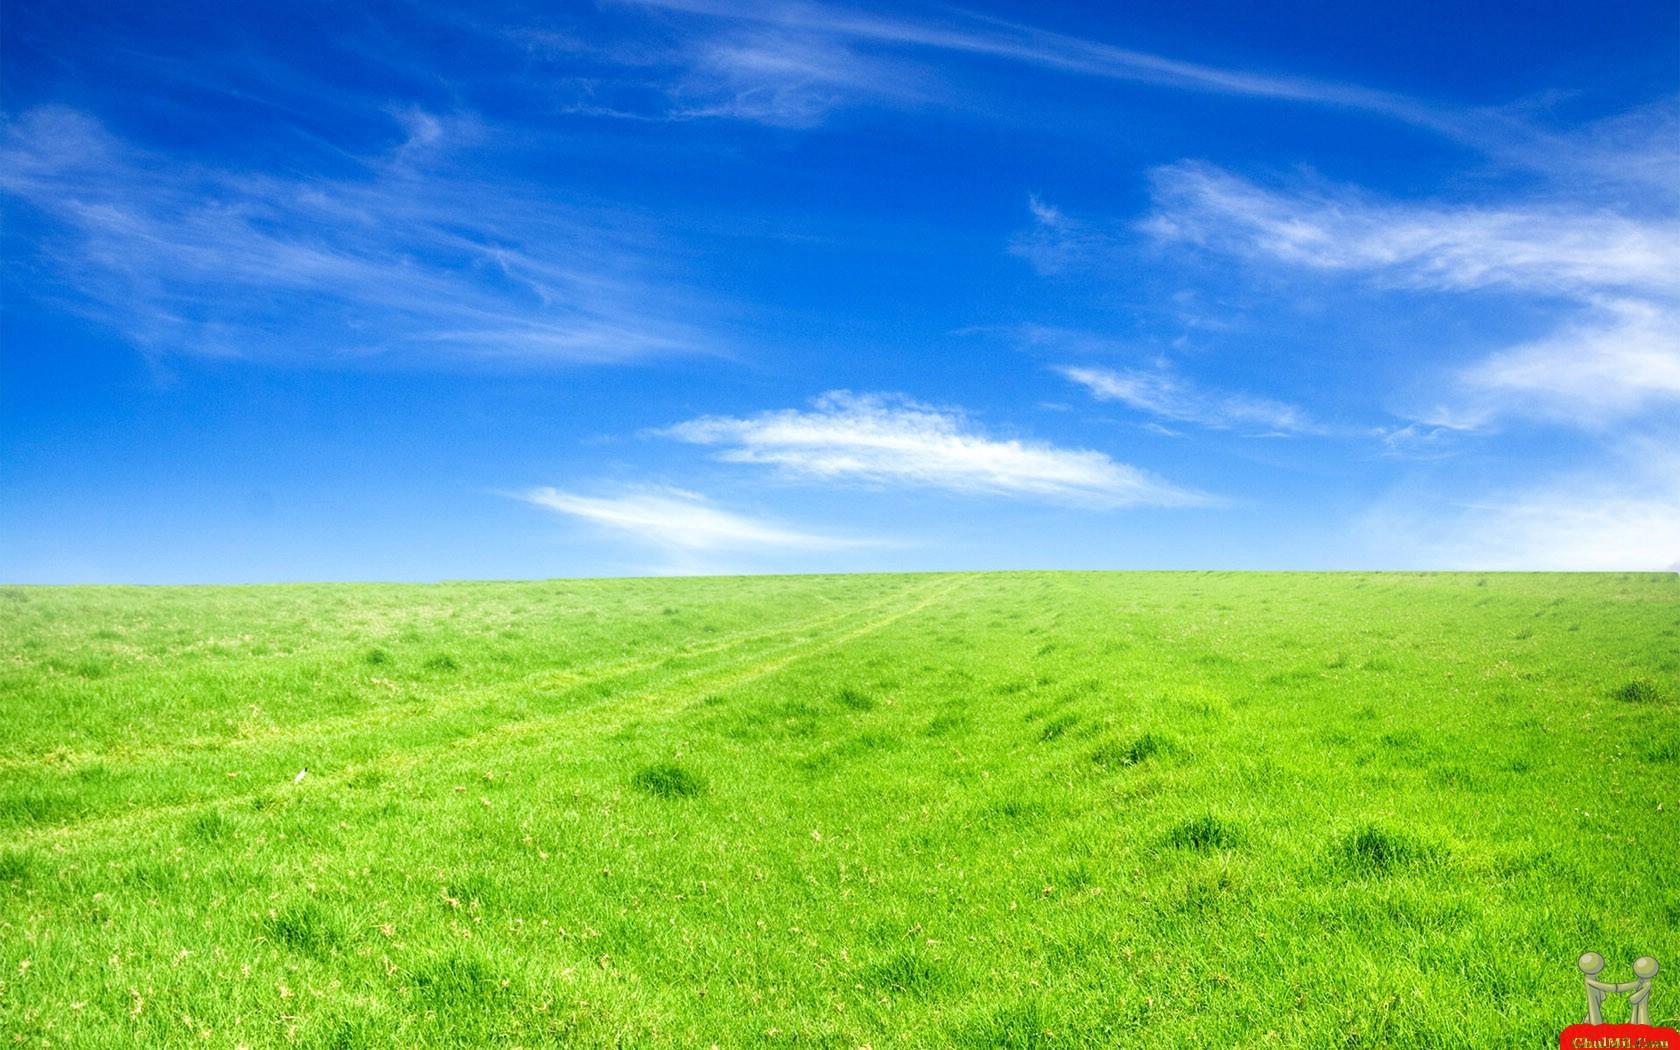 Greenery Scenery Desktop Wallpapers HD Wallpapers Download 1680x1050